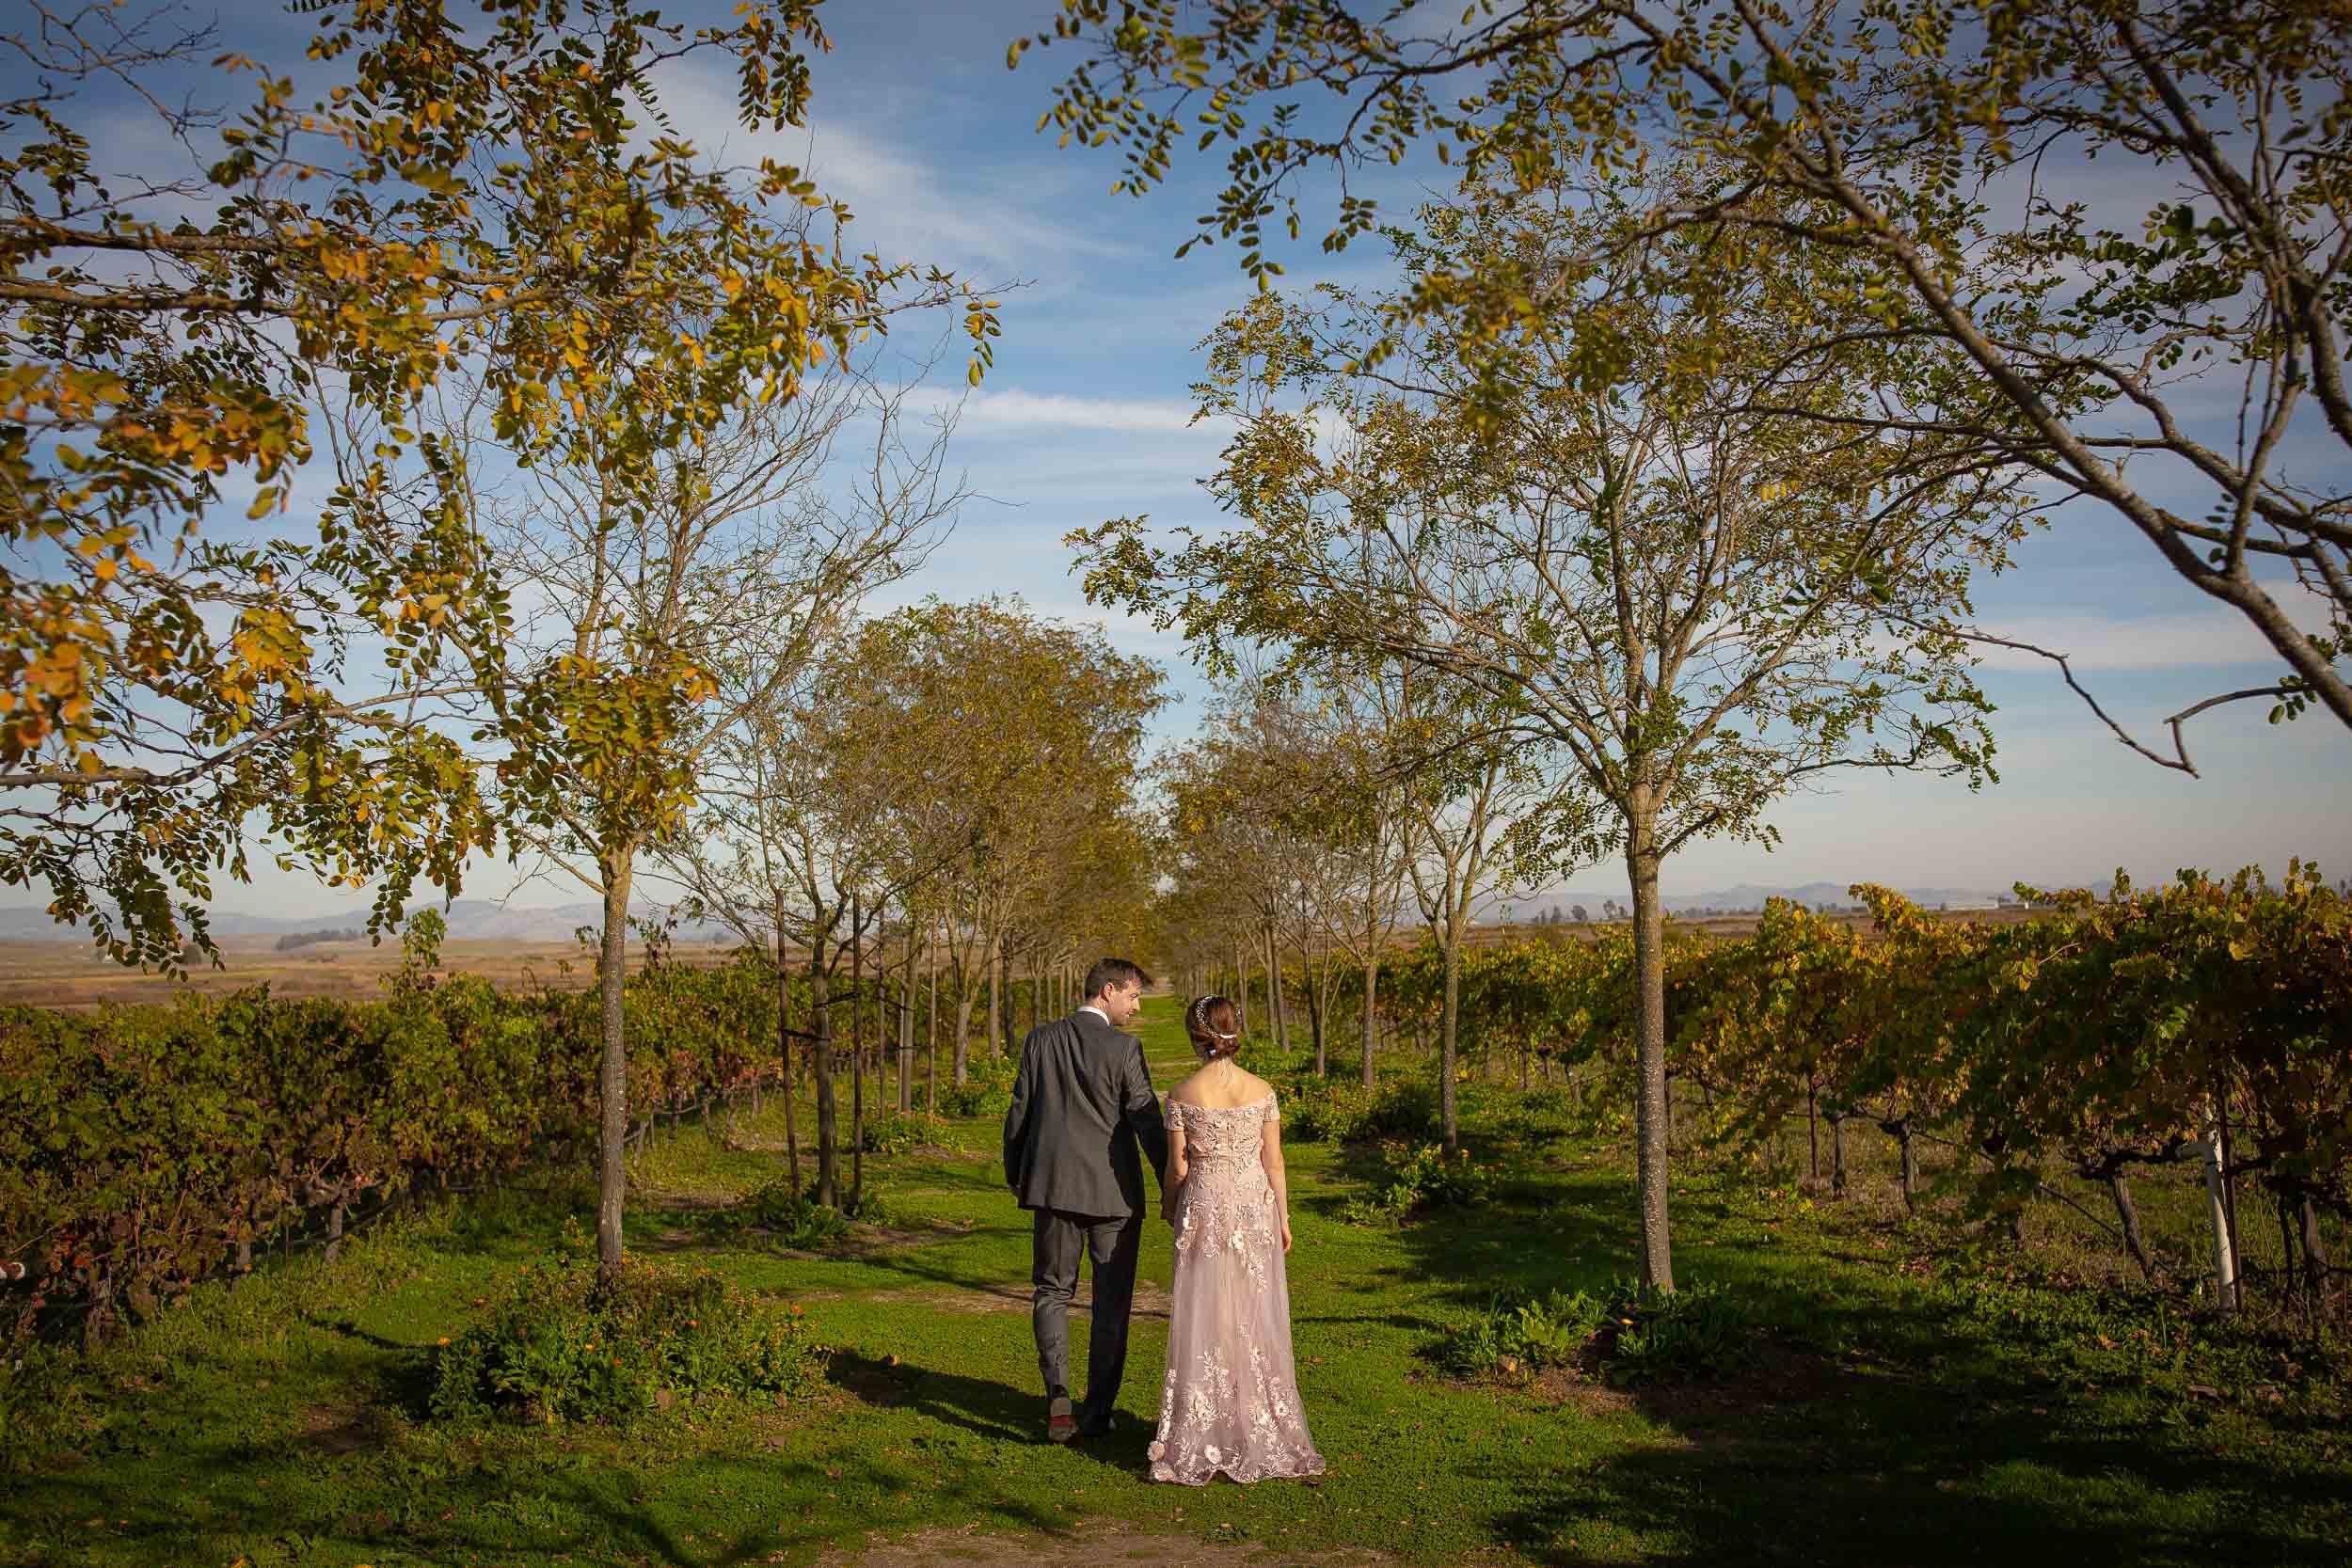 Jacuzzi Family Vineyards Wedding Photos-10.jpg